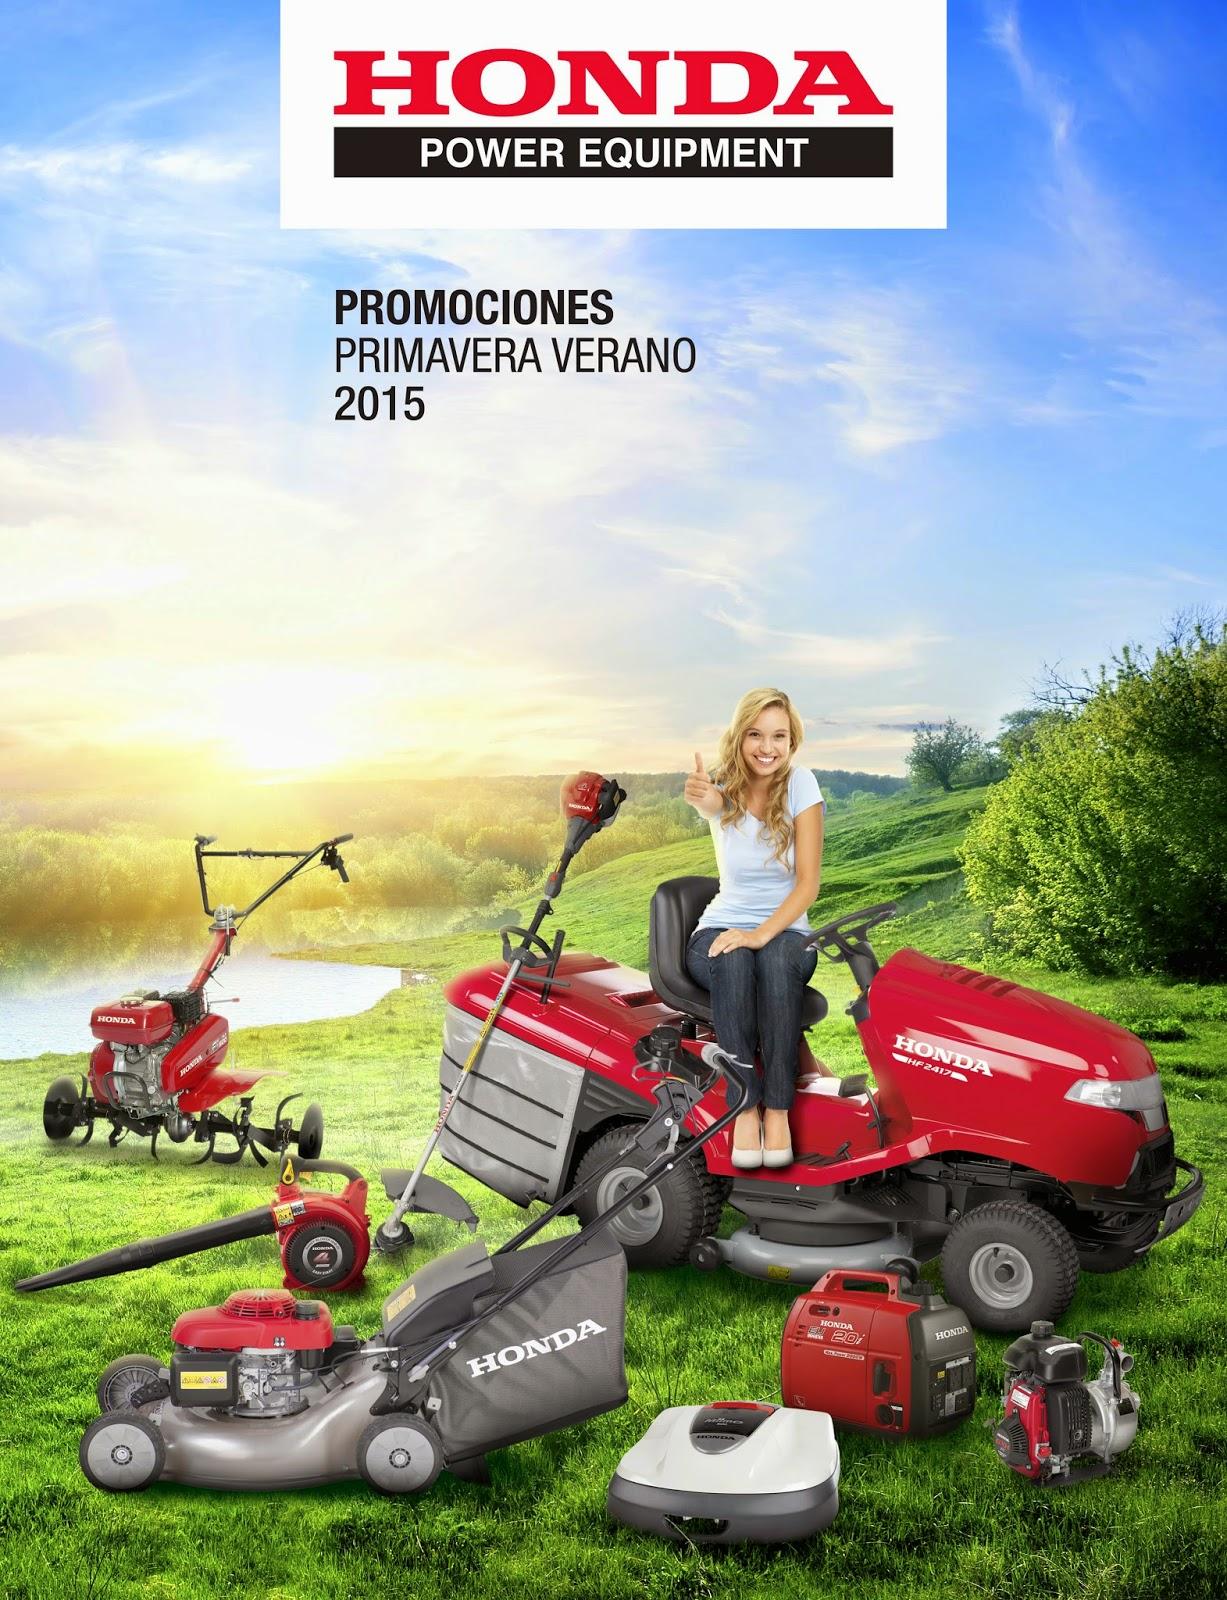 Hondaencasa blog promociones primavera verano honda for Honda jardin 2015